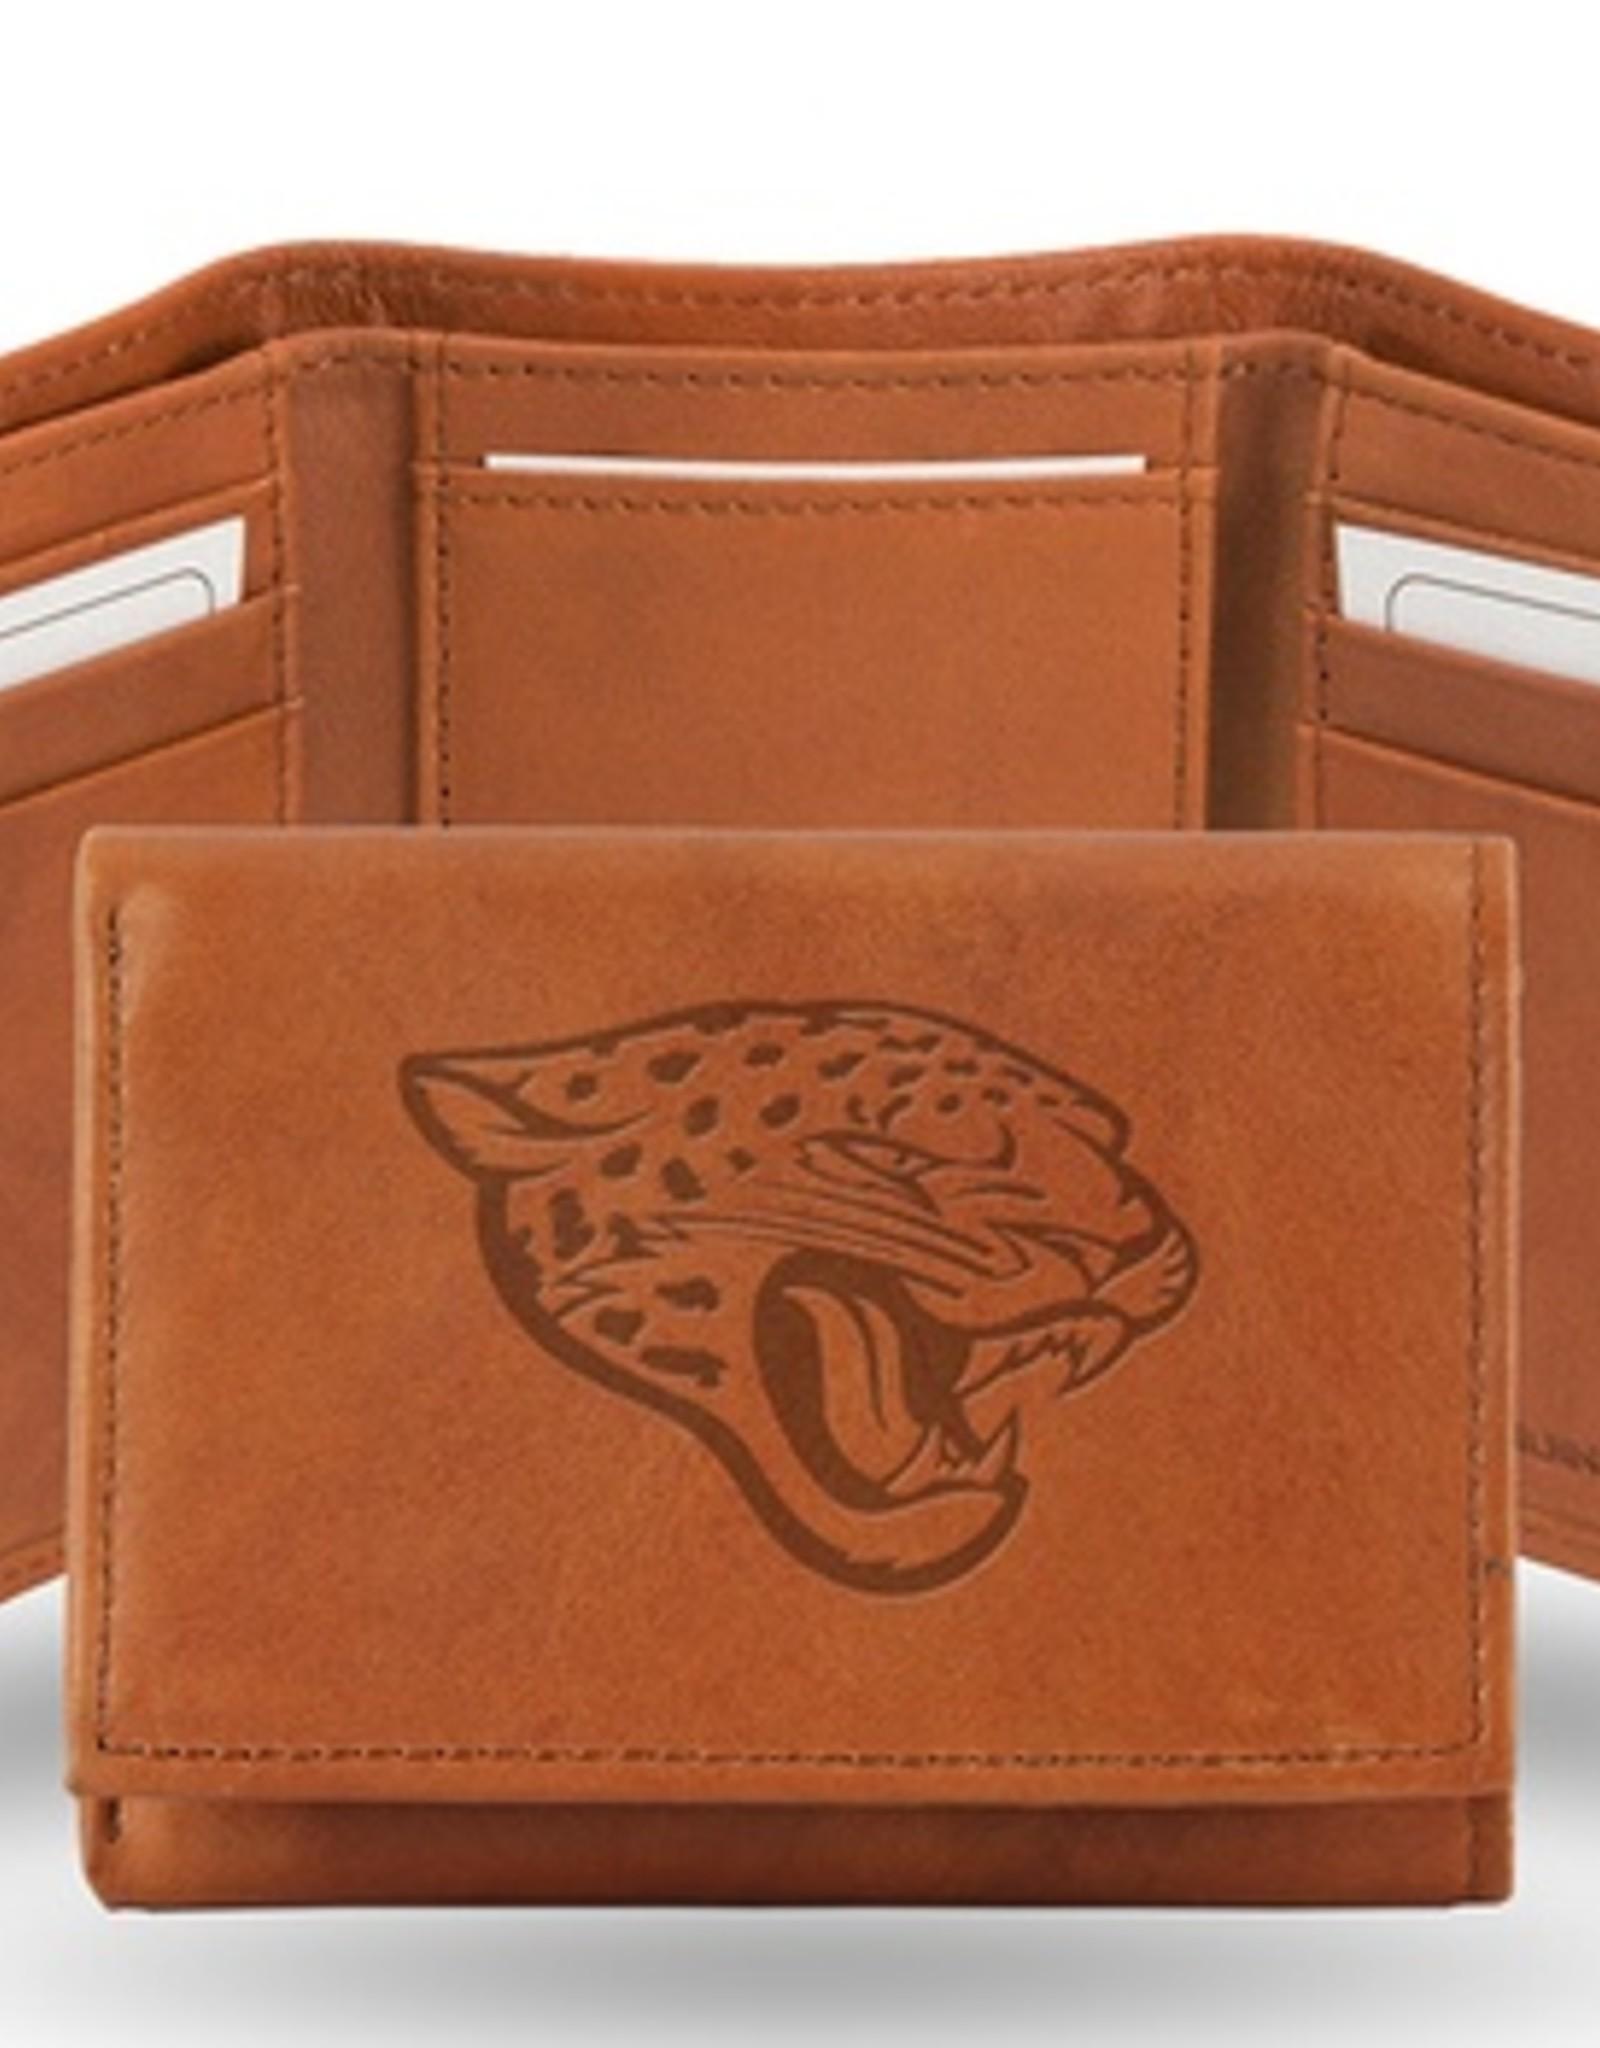 RICO INDUSTRIES Jacksonville Jaguars Genuine Leather Vintage Trifold Wallet